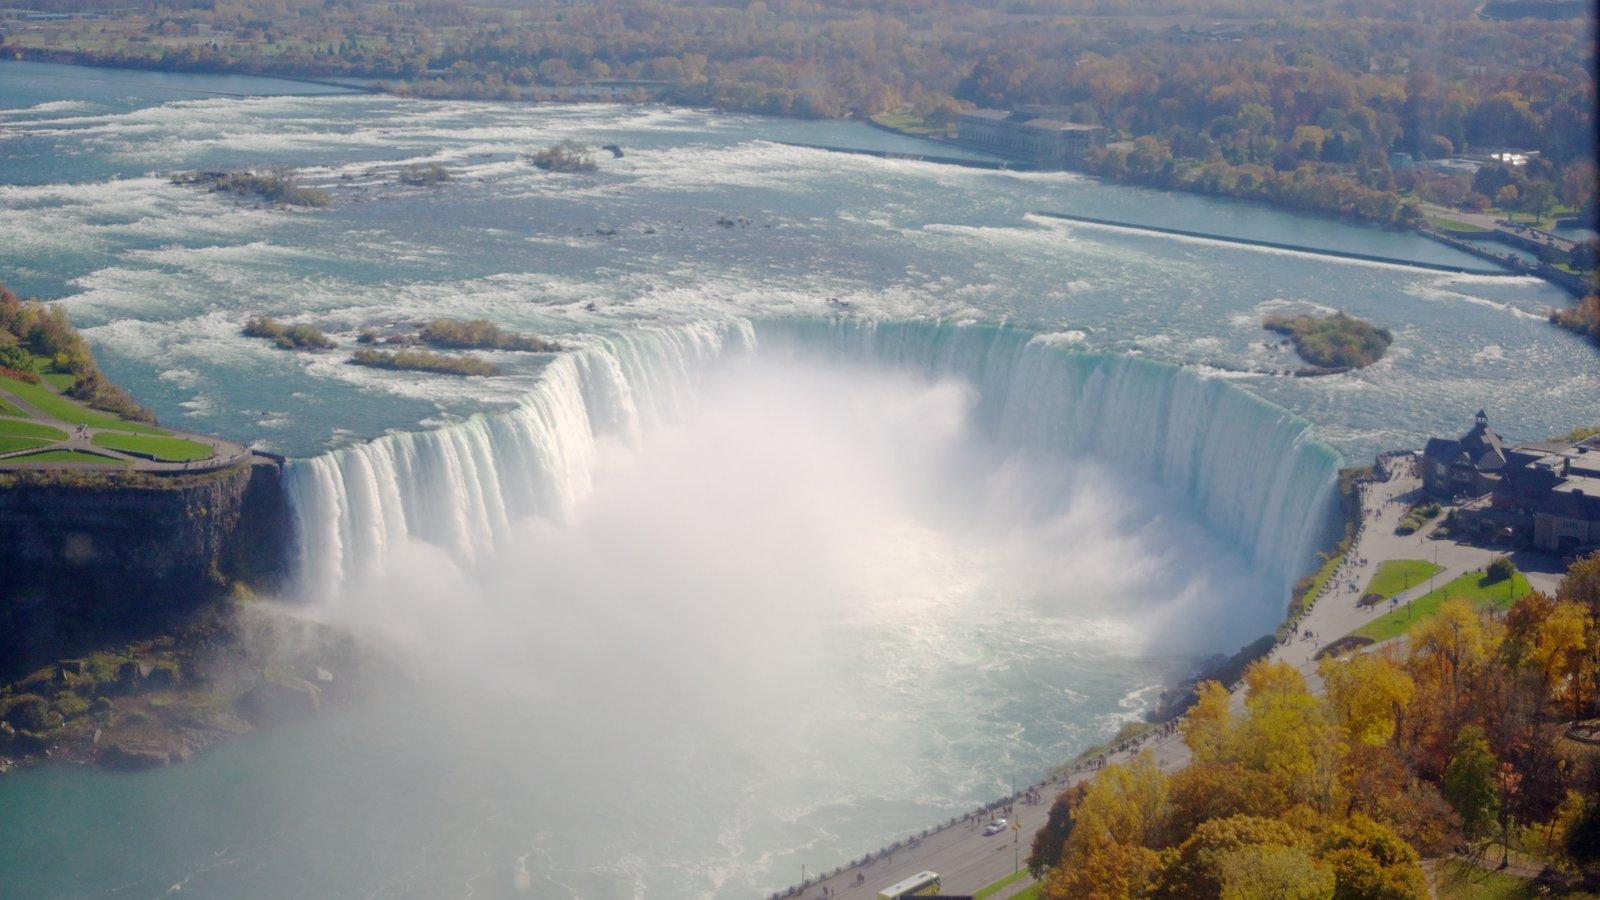 Niagara Falls caracterizando uma cachoeira